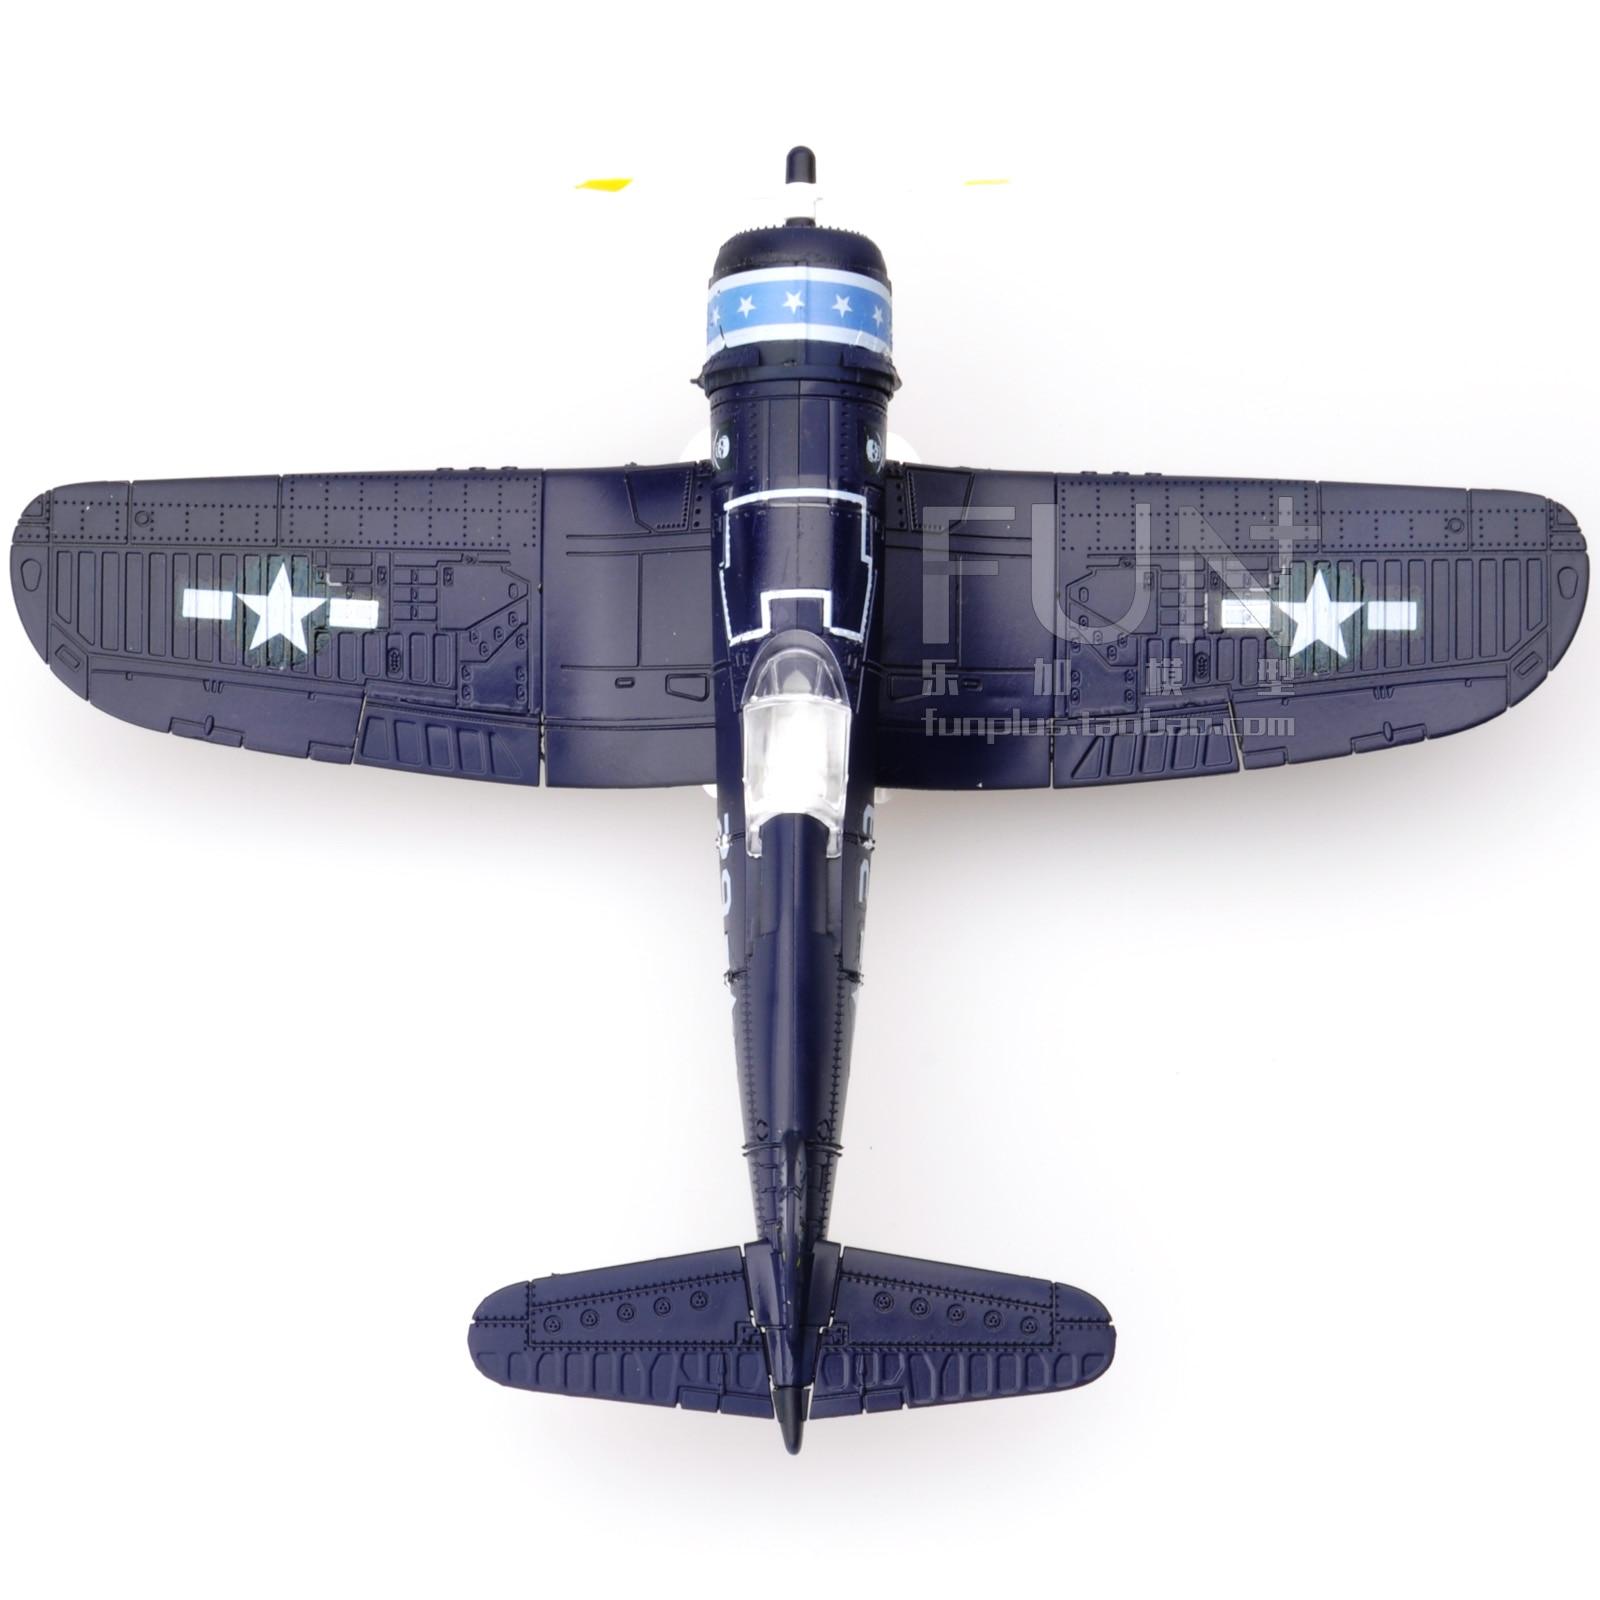 1:48 Assembled Puzzle F4U Aircraft Model Simulation Military Toy Collection1:48 Assembled Puzzle F4U Aircraft Model Simulation Military Toy Collection